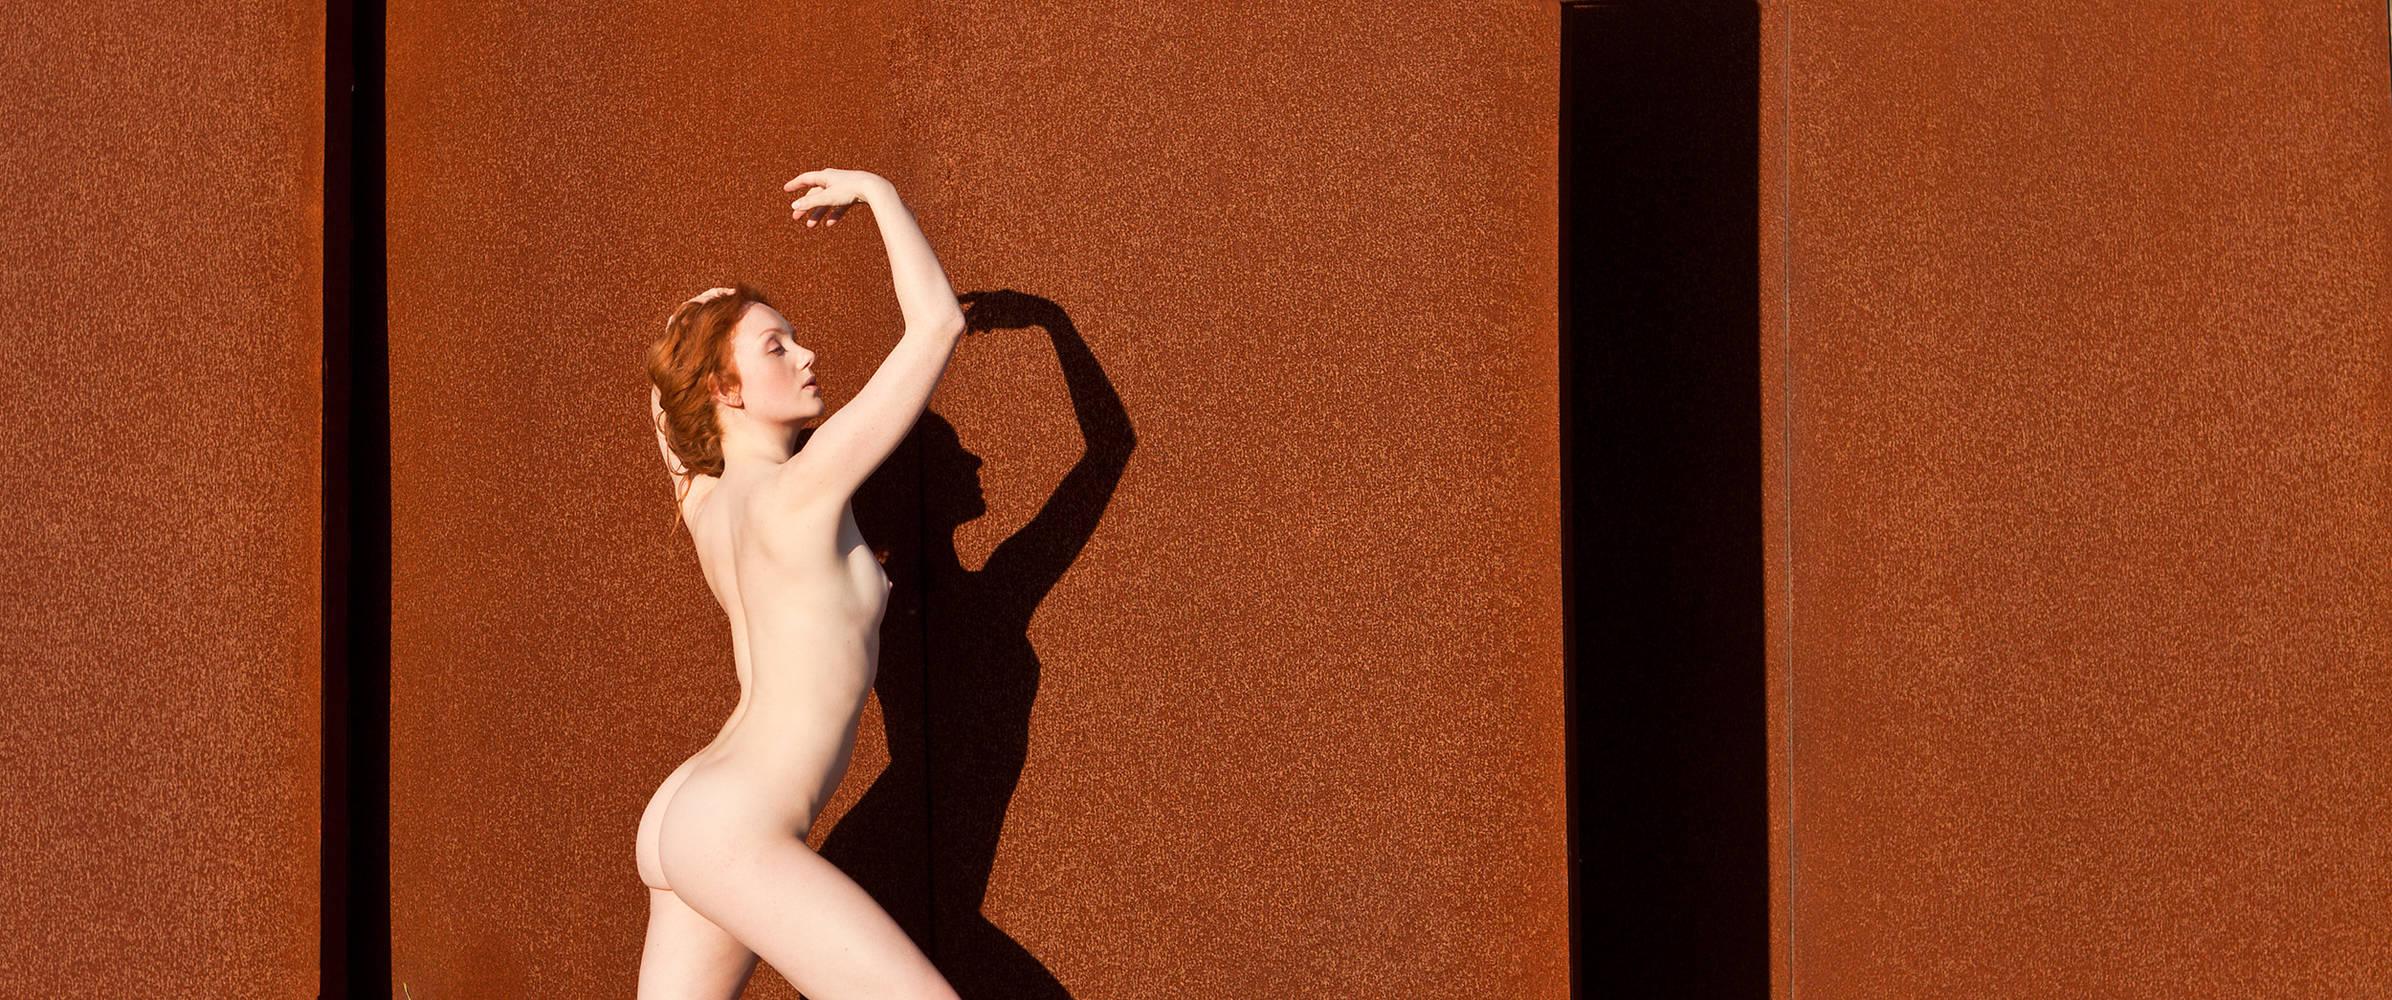 Artistic Figure Nude model Ivory Flame against rust by Francisca da Silva in Portugal